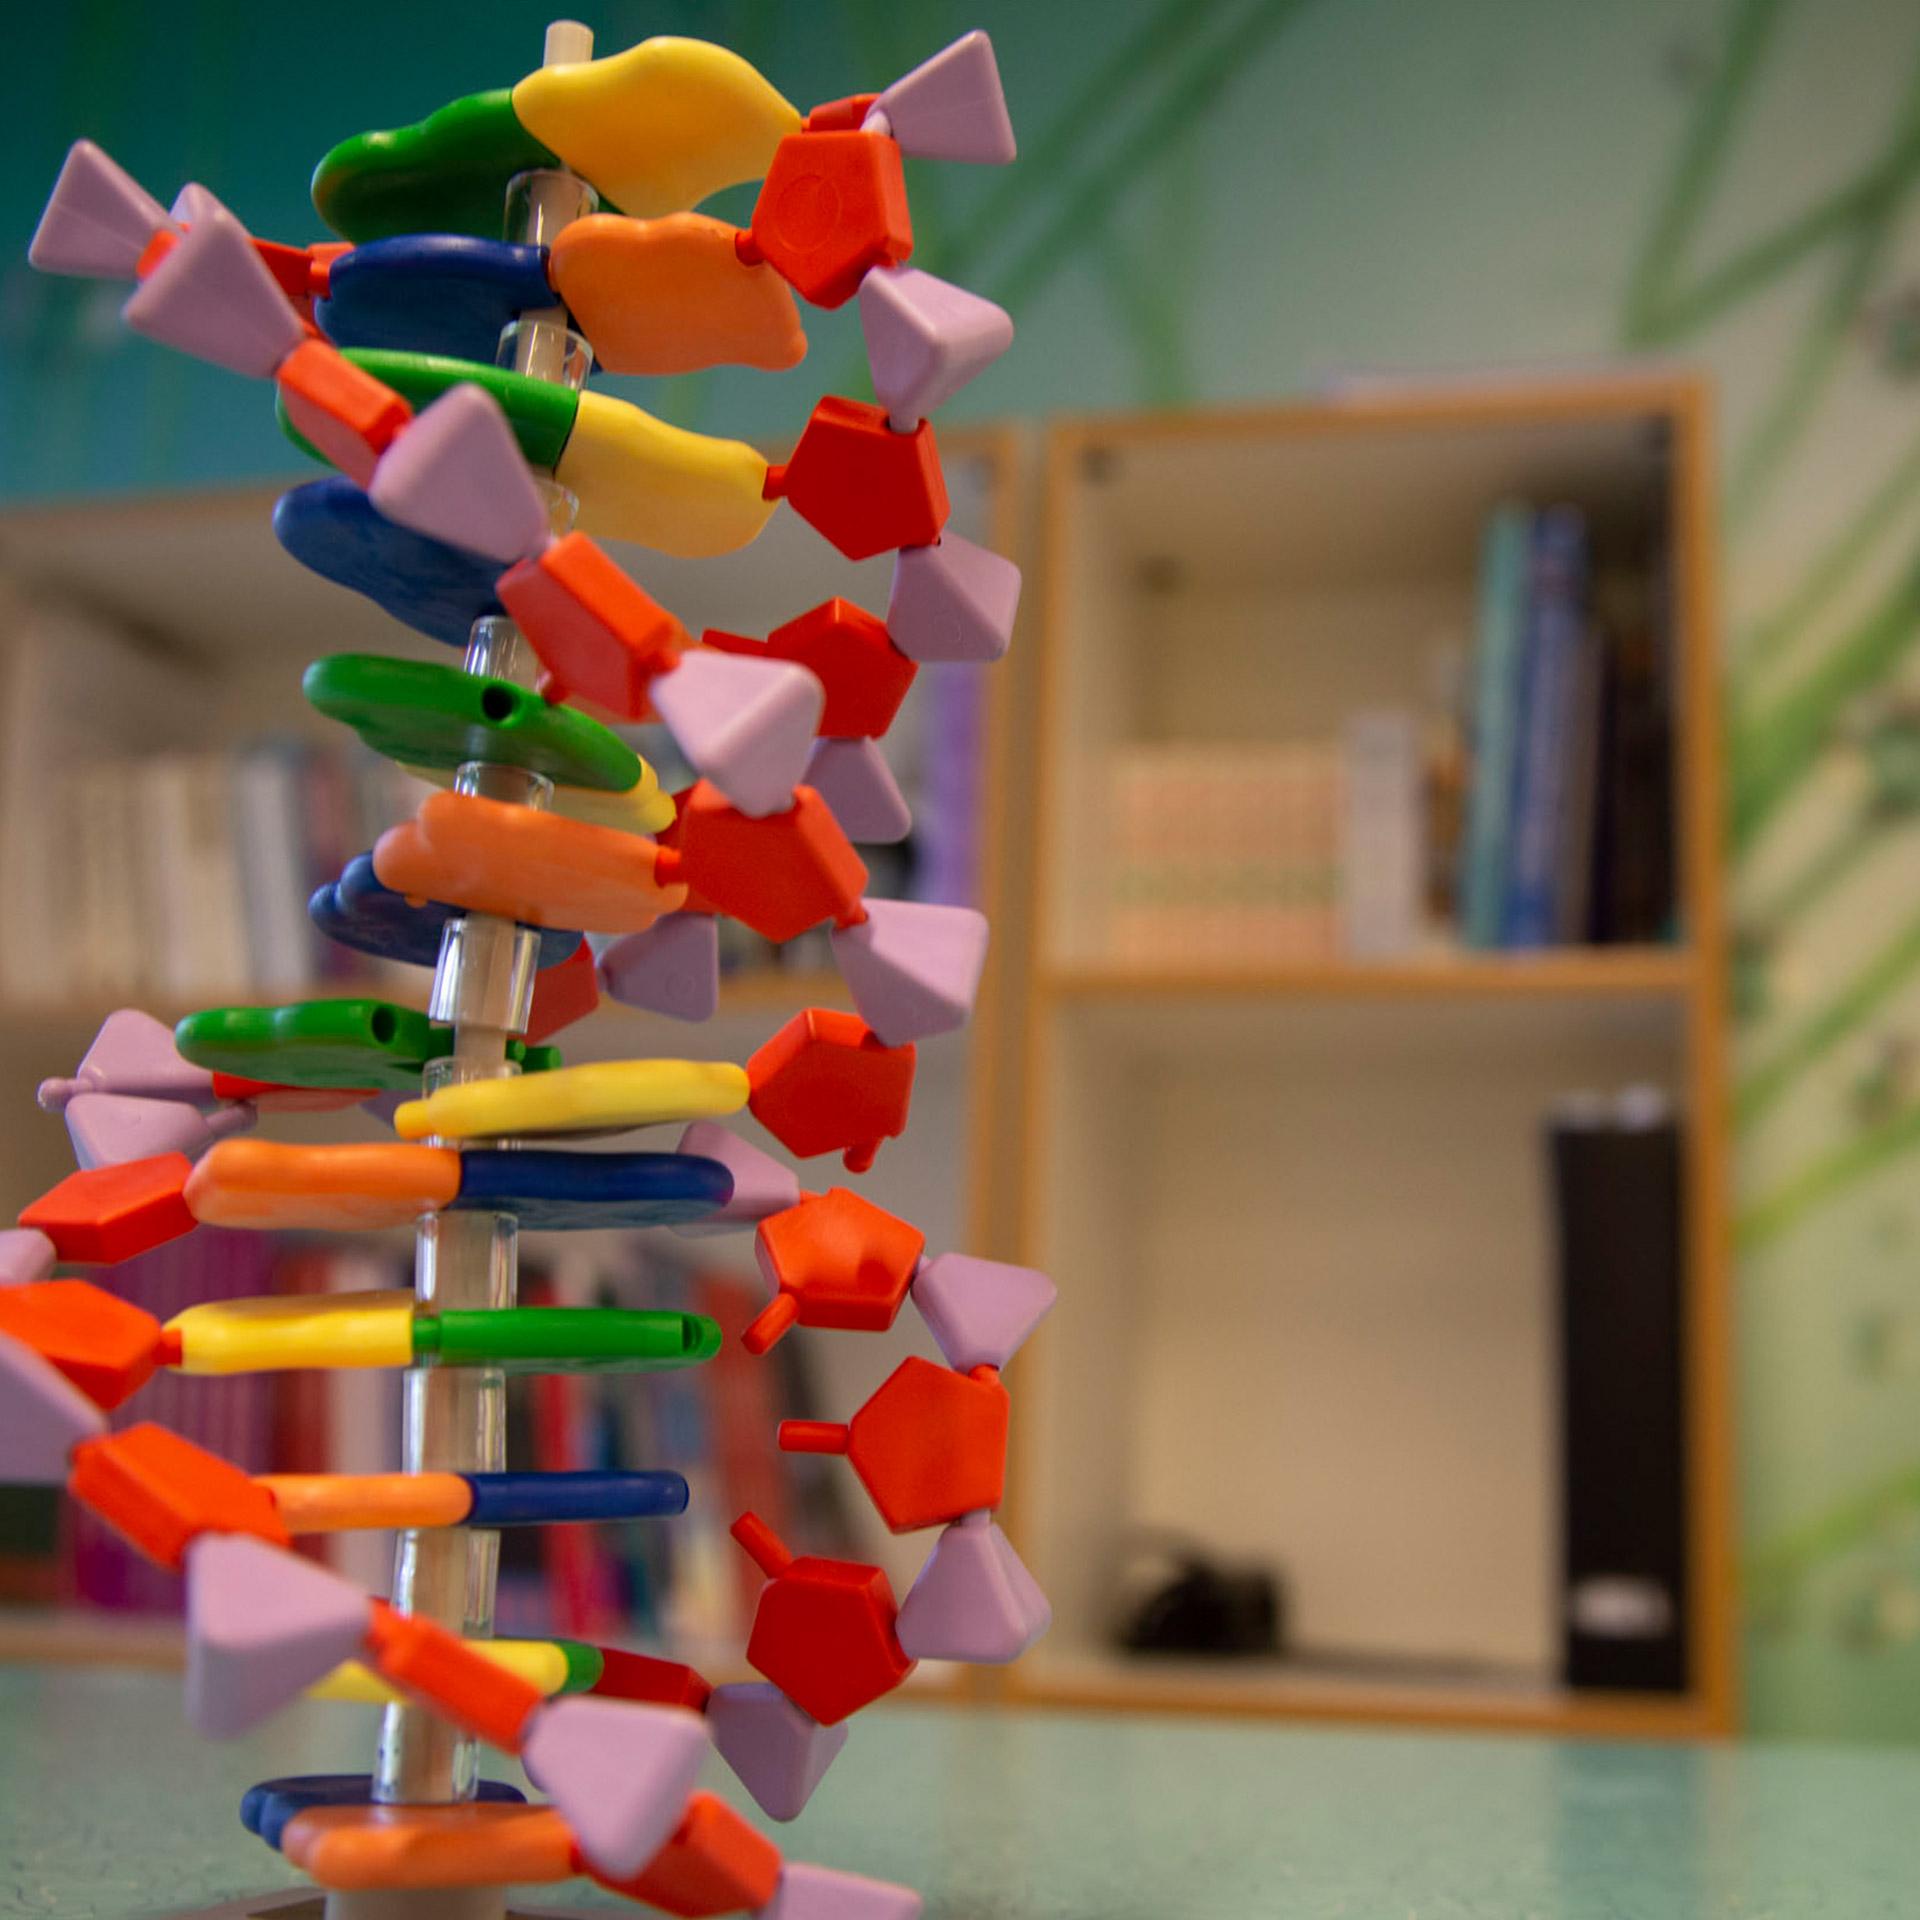 Klara Gymnasium – Naturvetenskapsprogrammet